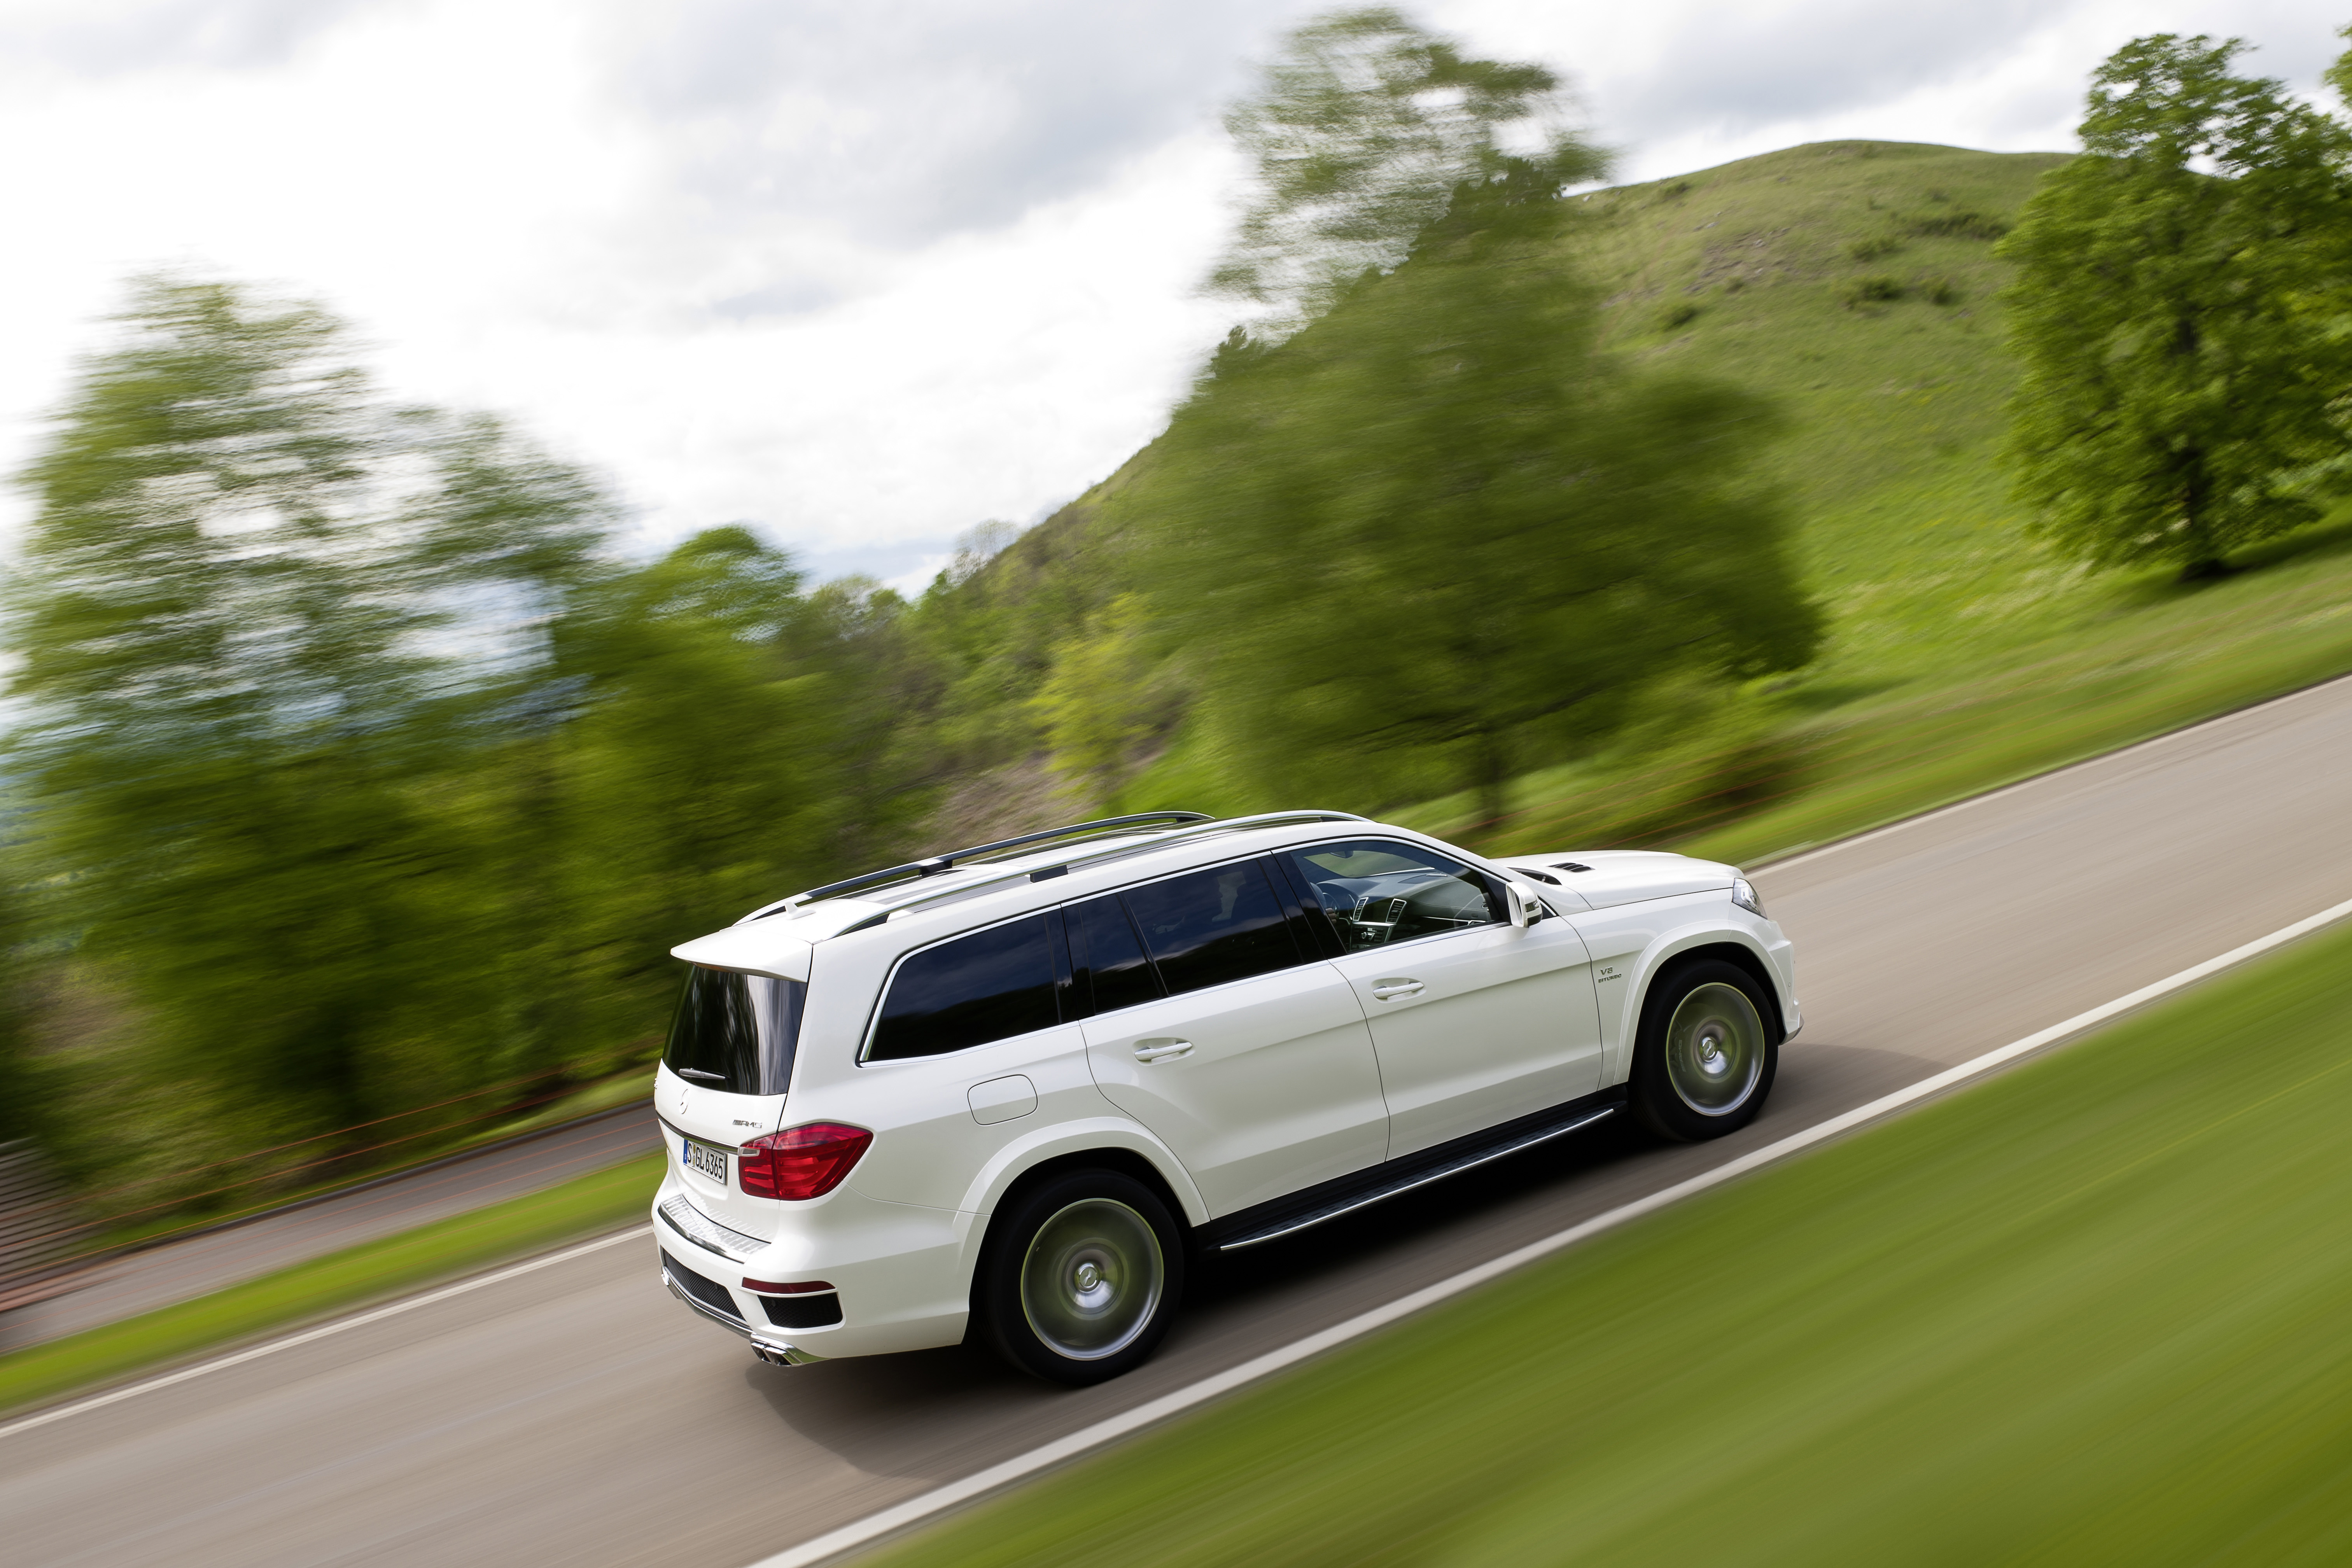 Driven mercedes benz gl63 amg wild speed for Mercedes benz amg range